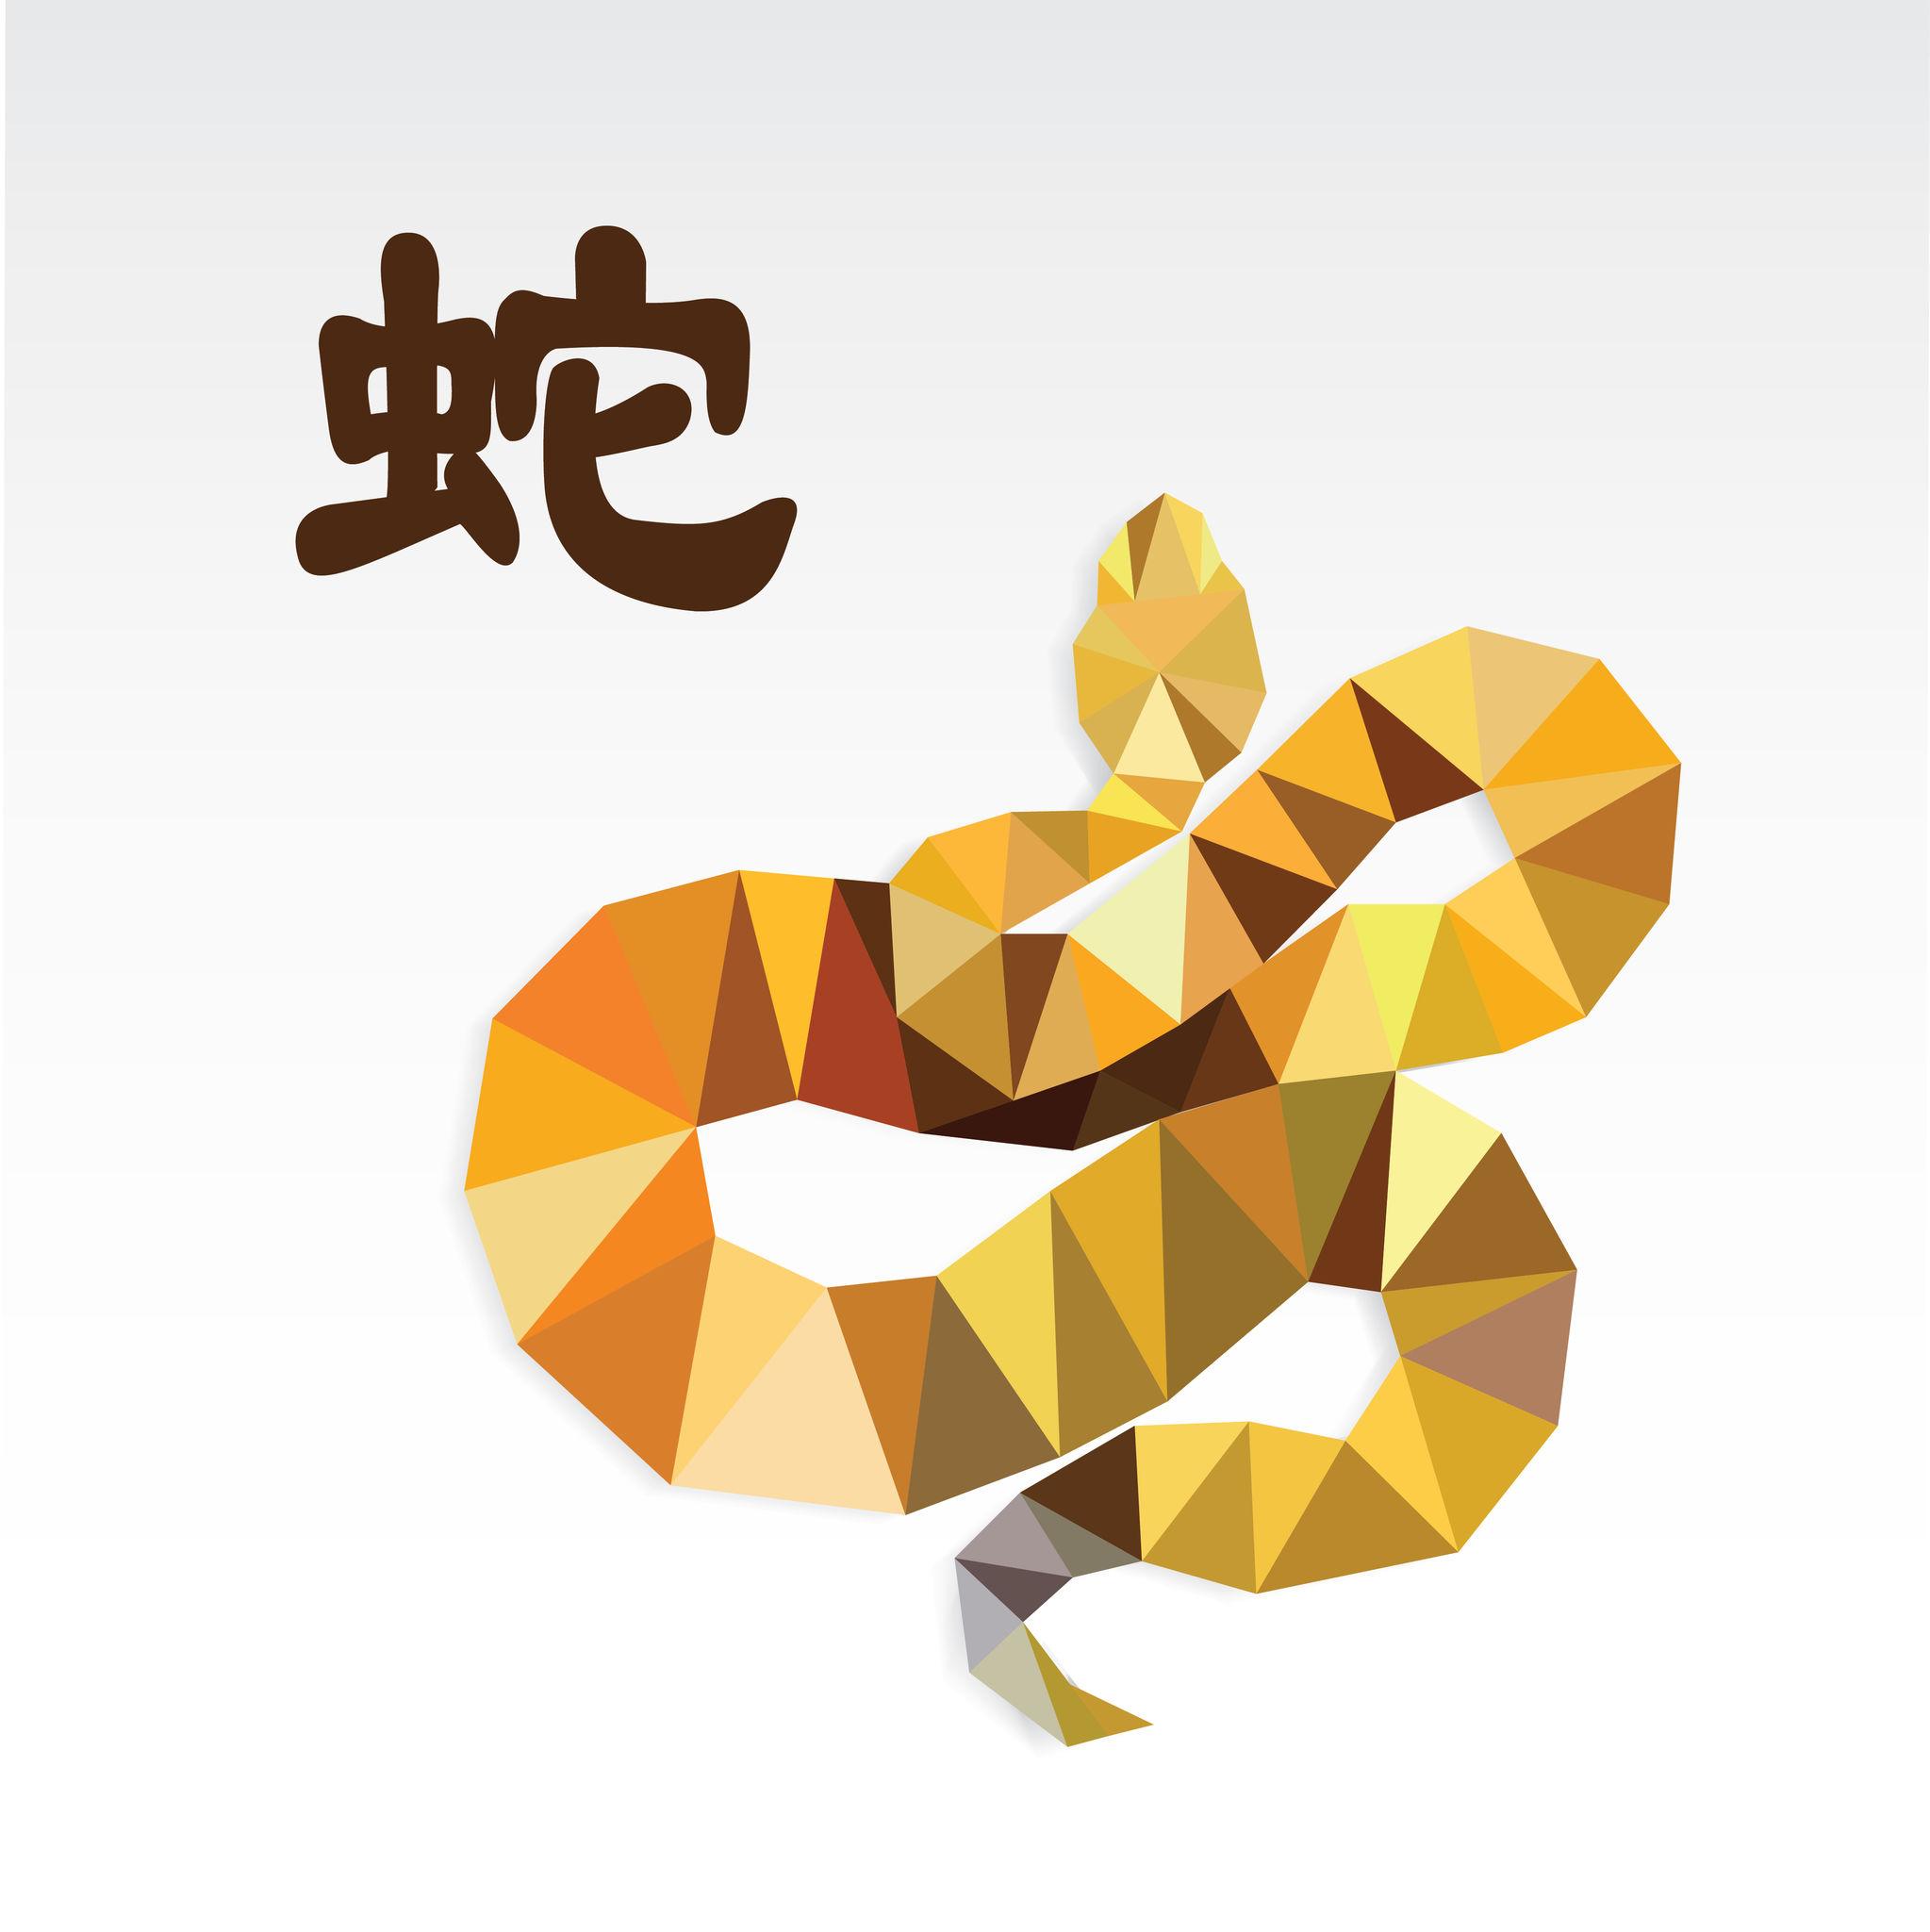 chinese horoscope 2020 prediction snake